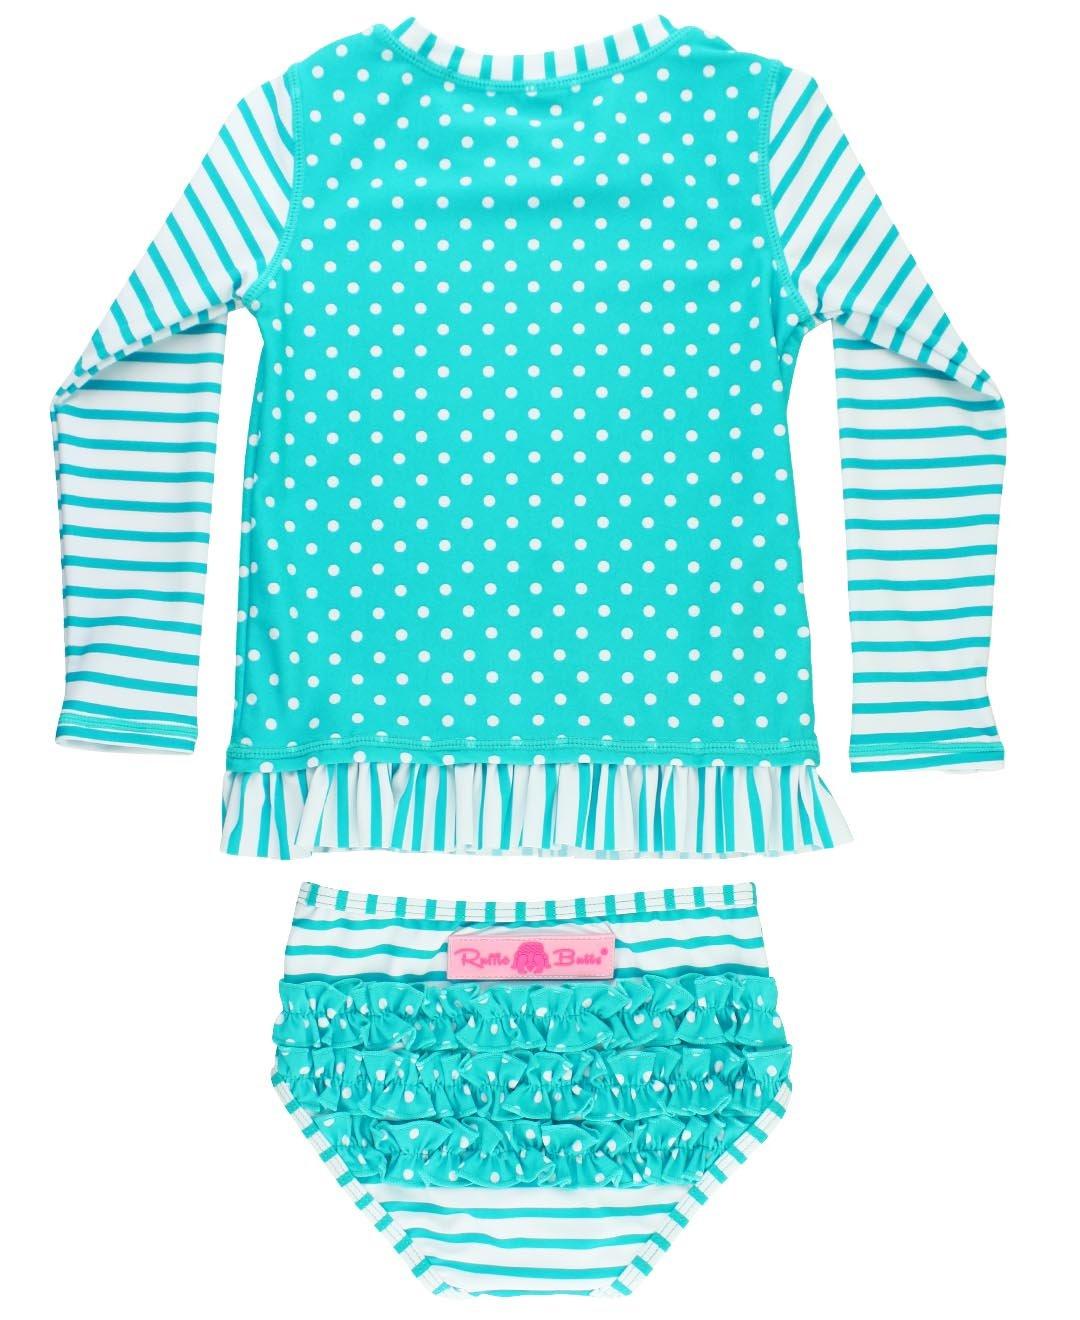 RuffleButts Little Girls Rash Guard 2-Piece Long Sleeve Swimsuit Set - Aqua Stripe Polka Dot UPF 50+ Sun Protection - 3T